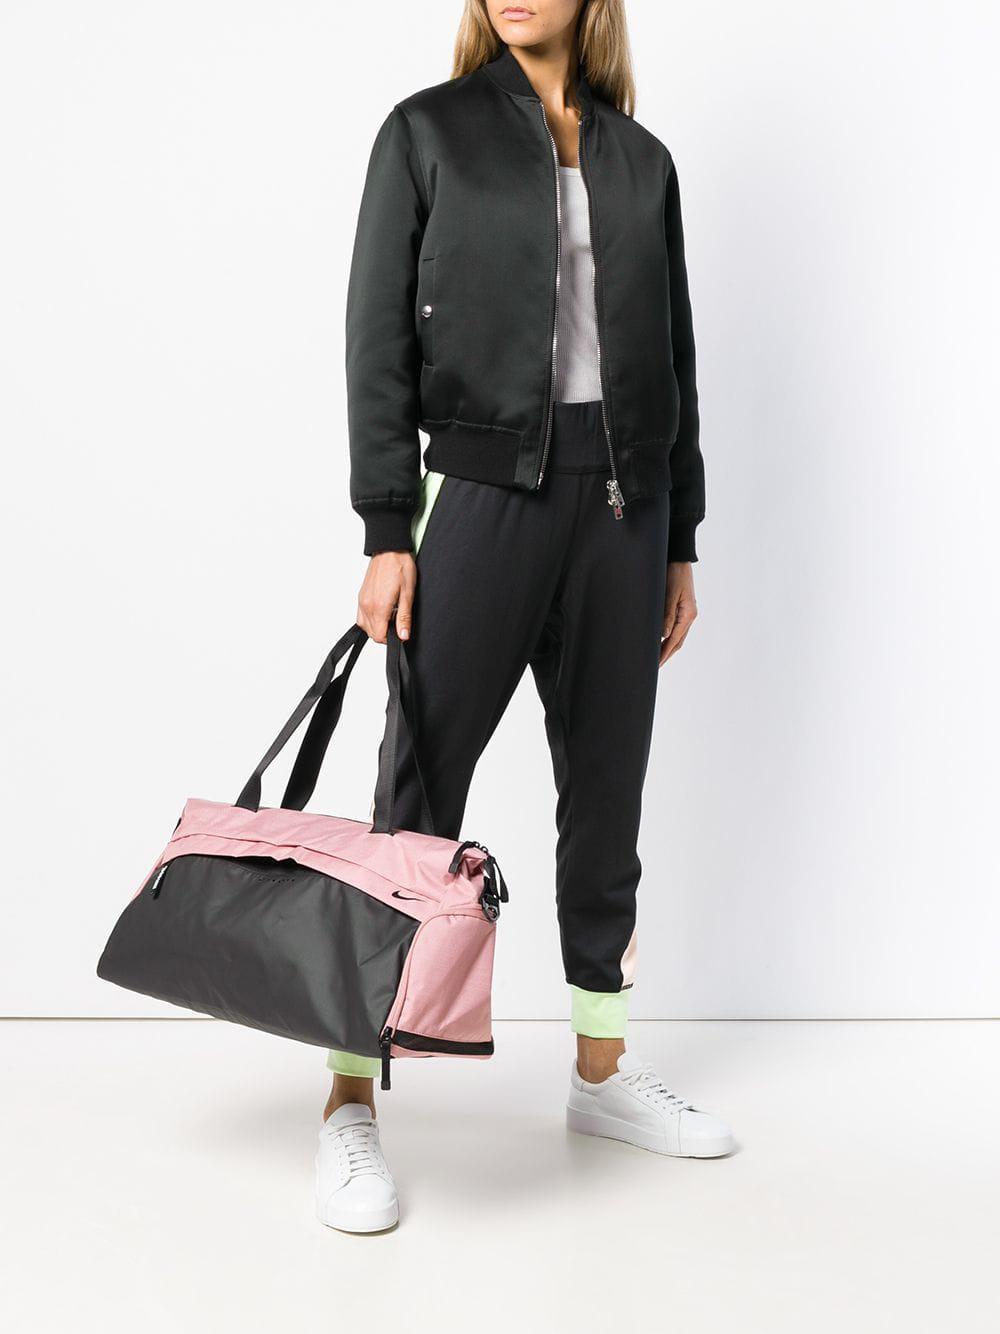 baa982ecb0 Lyst - Nike Radiate Club Training Bag in Pink